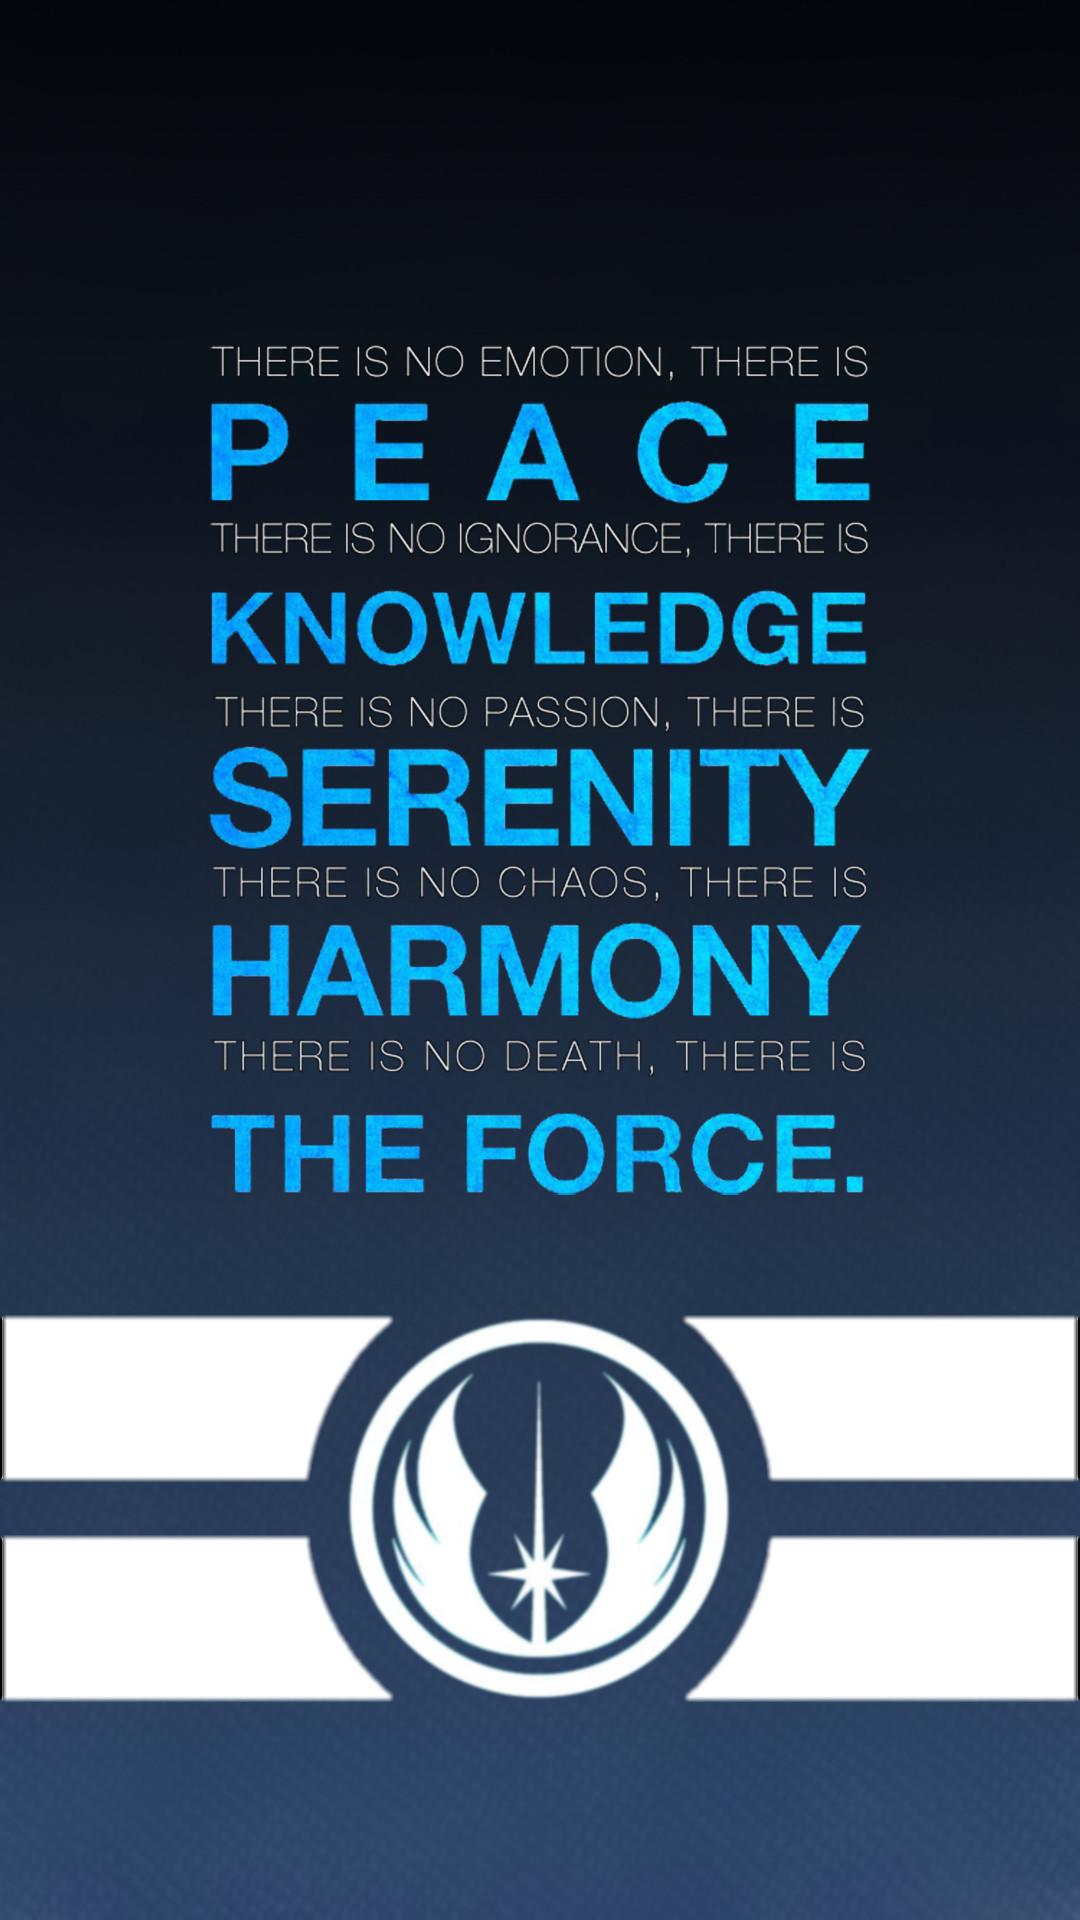 Jedi background